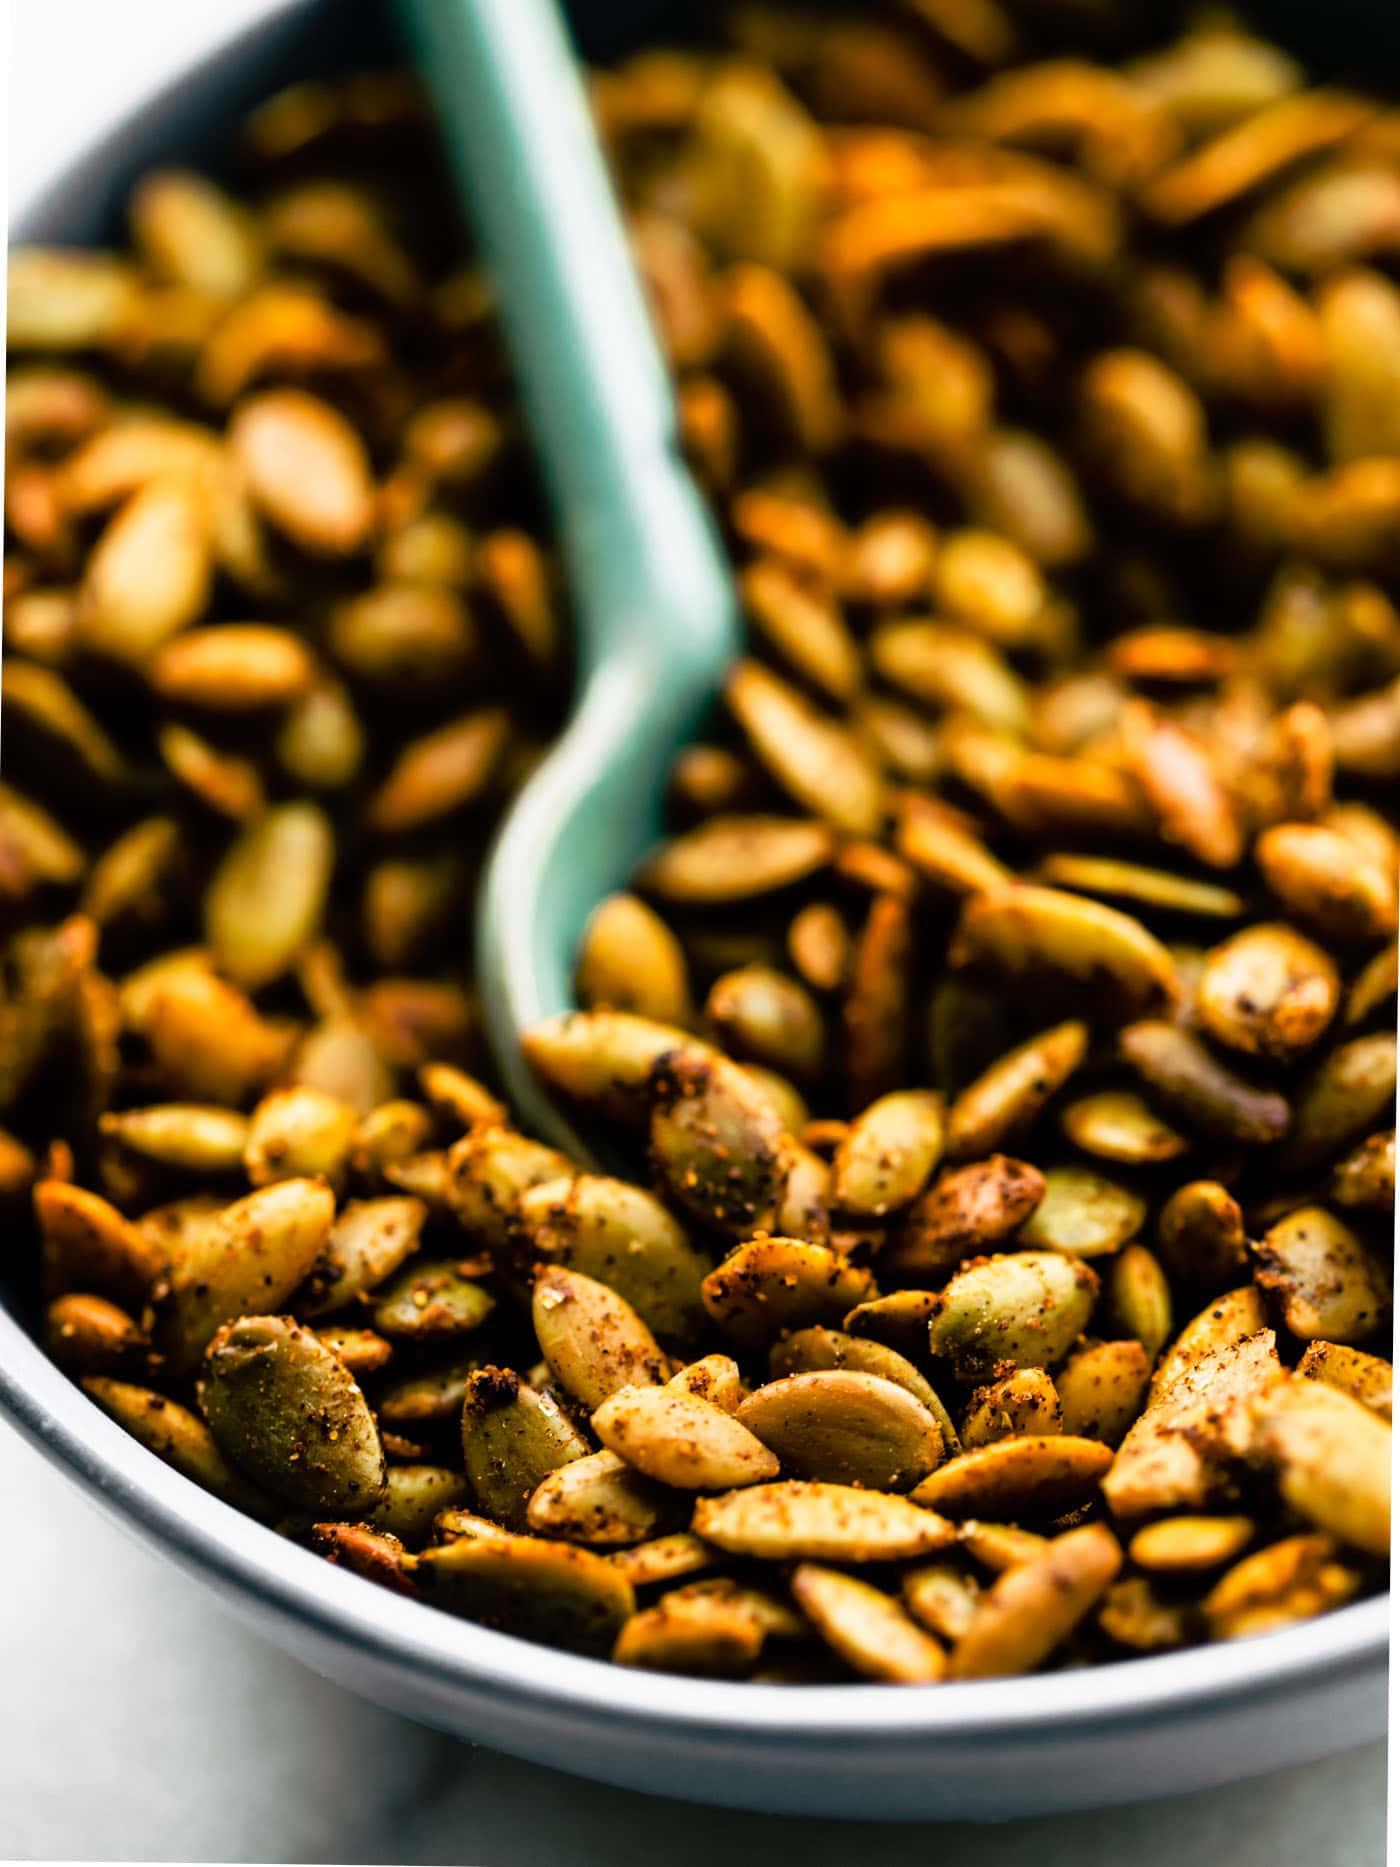 Close up image of seasoned and roasted pepitas